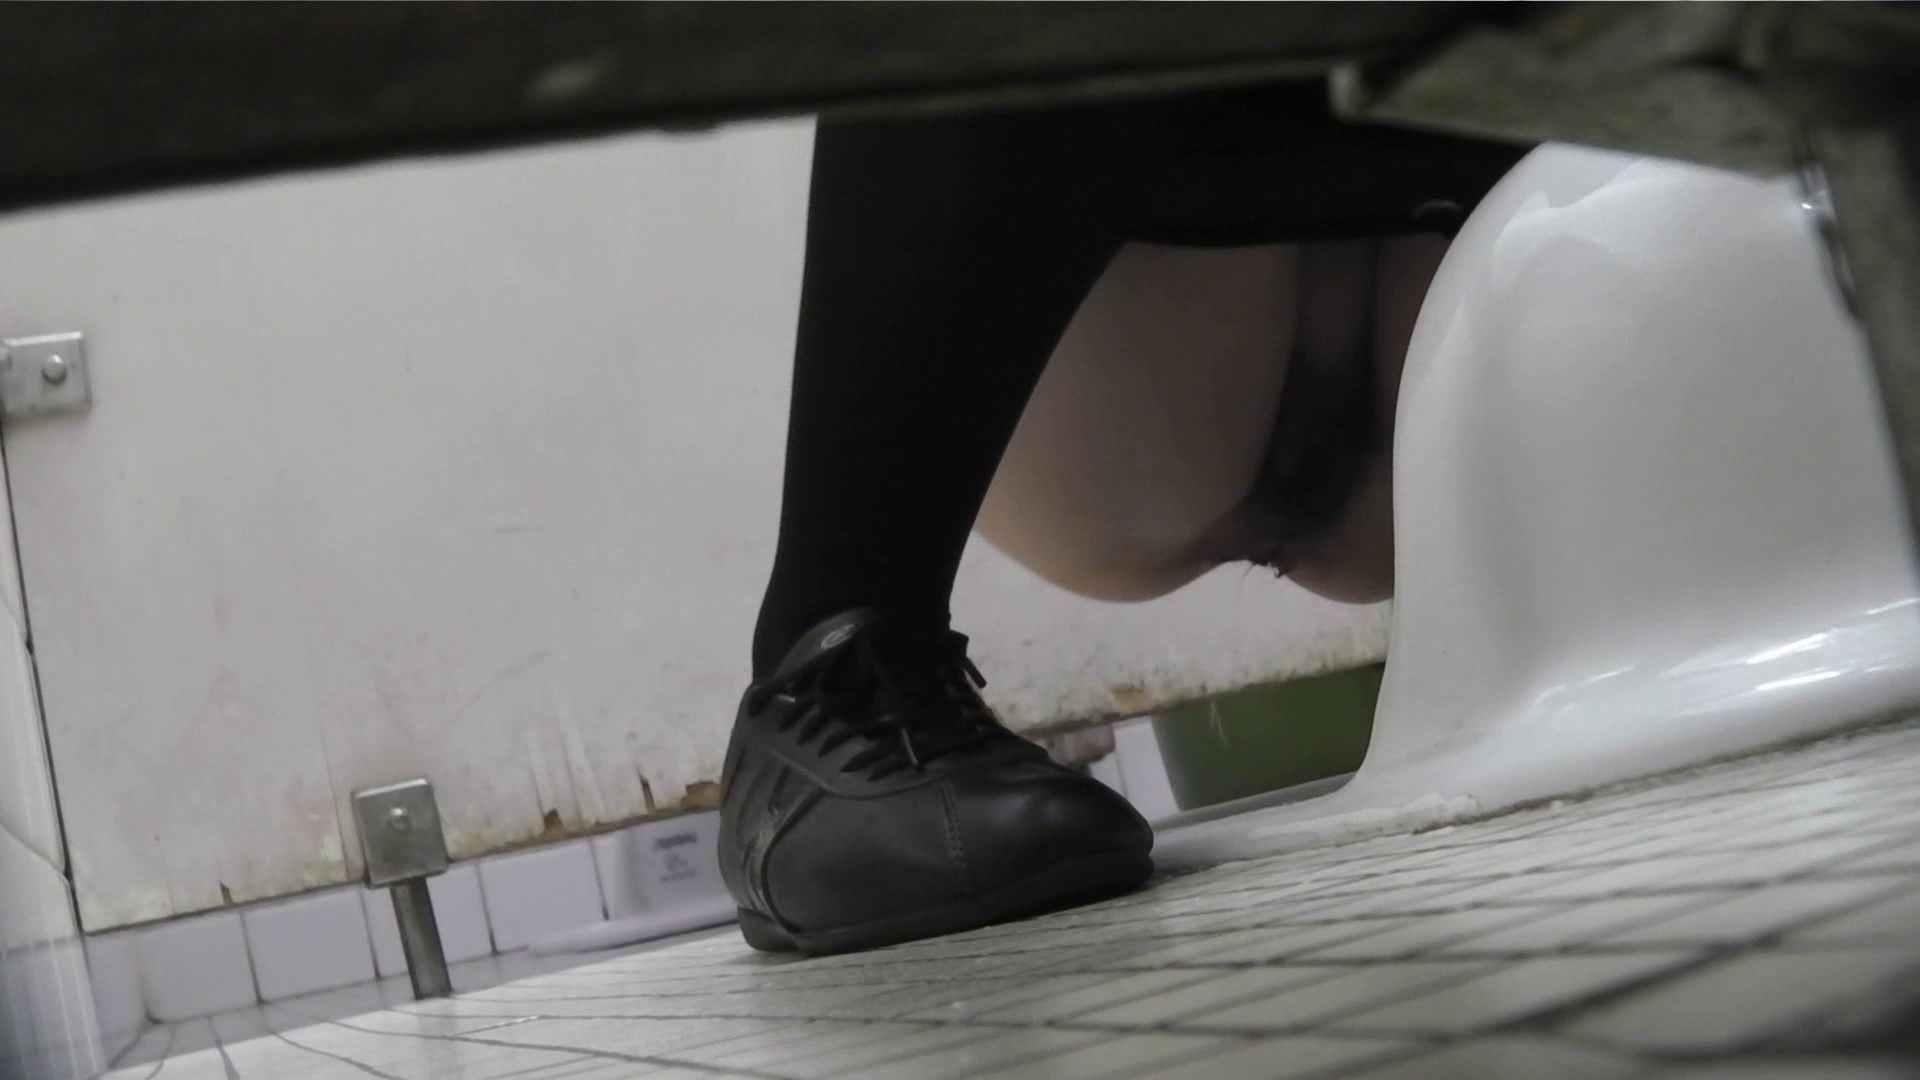 vol.06 命がけ潜伏洗面所! 茶髪タン、ハァハァ 前編 プライベート | 洗面所  107連発 61